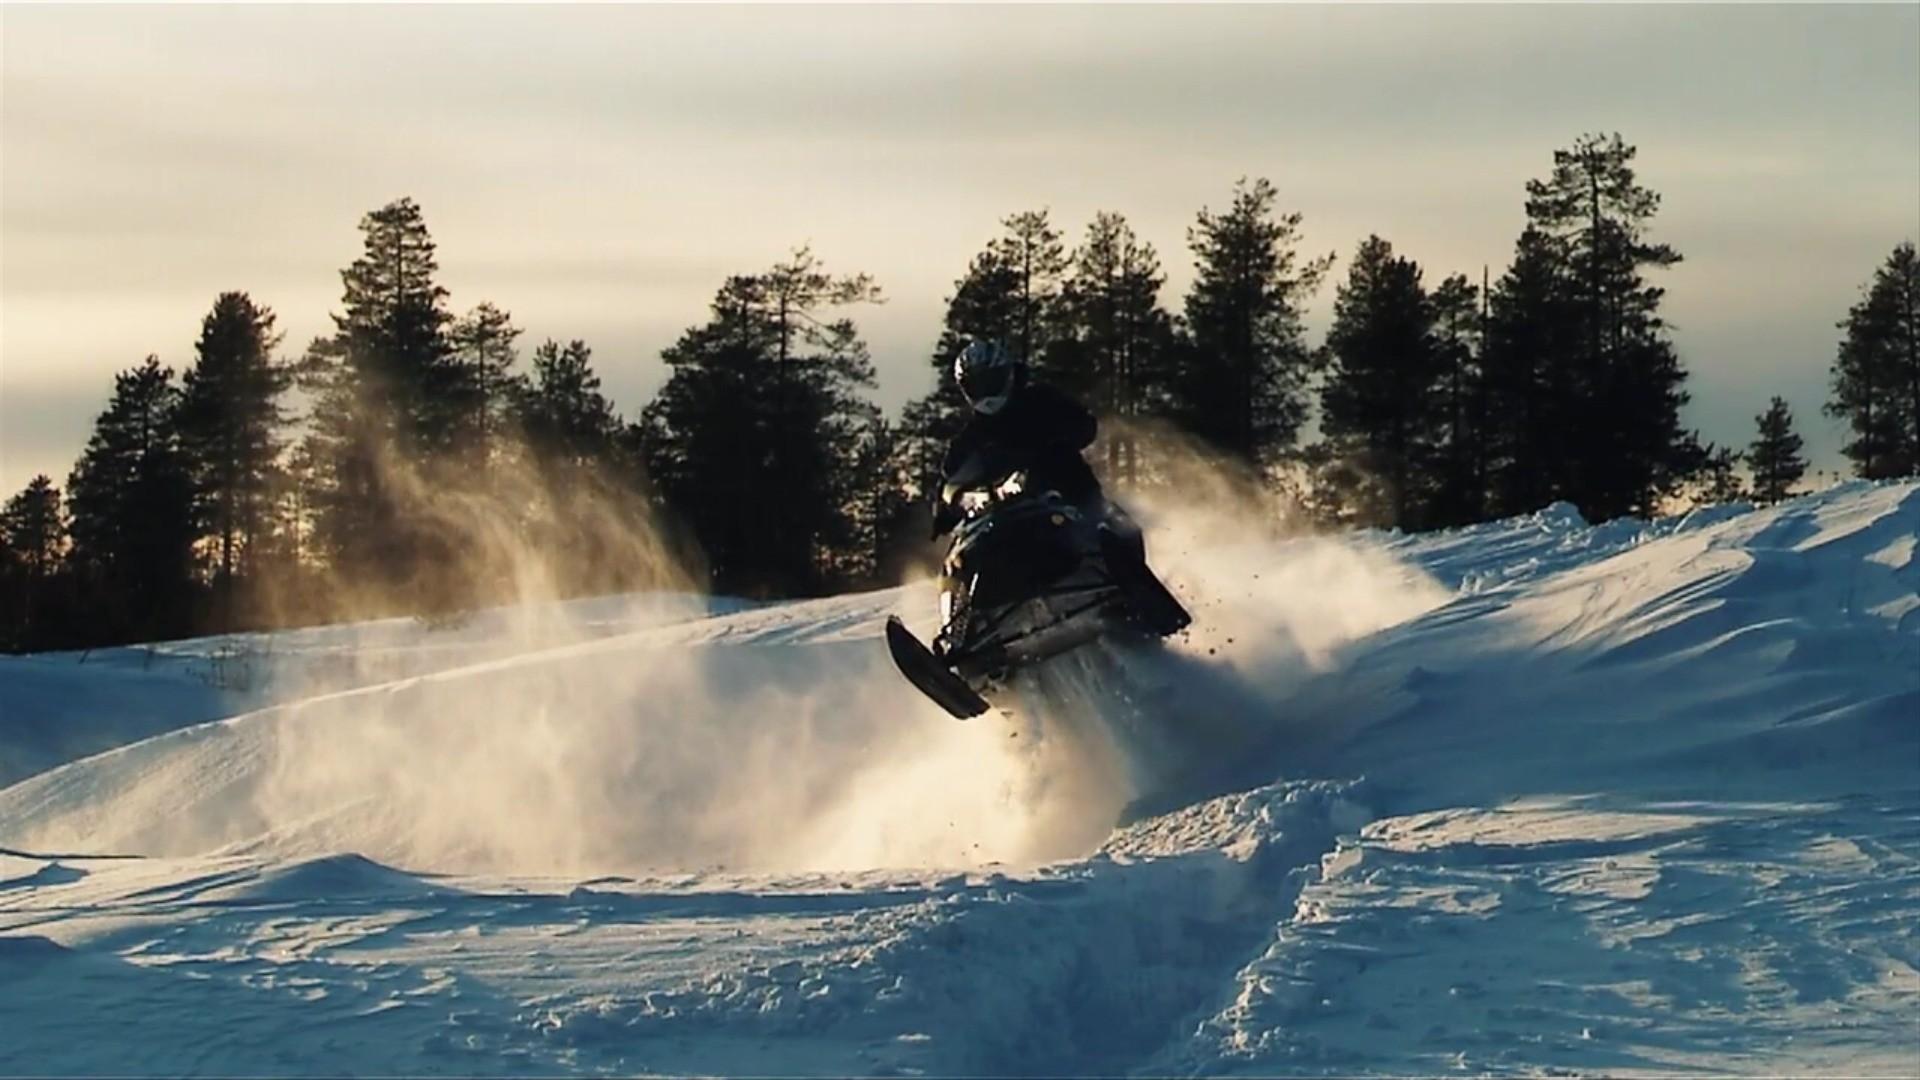 Vehicles / Snowmobile Wallpaper